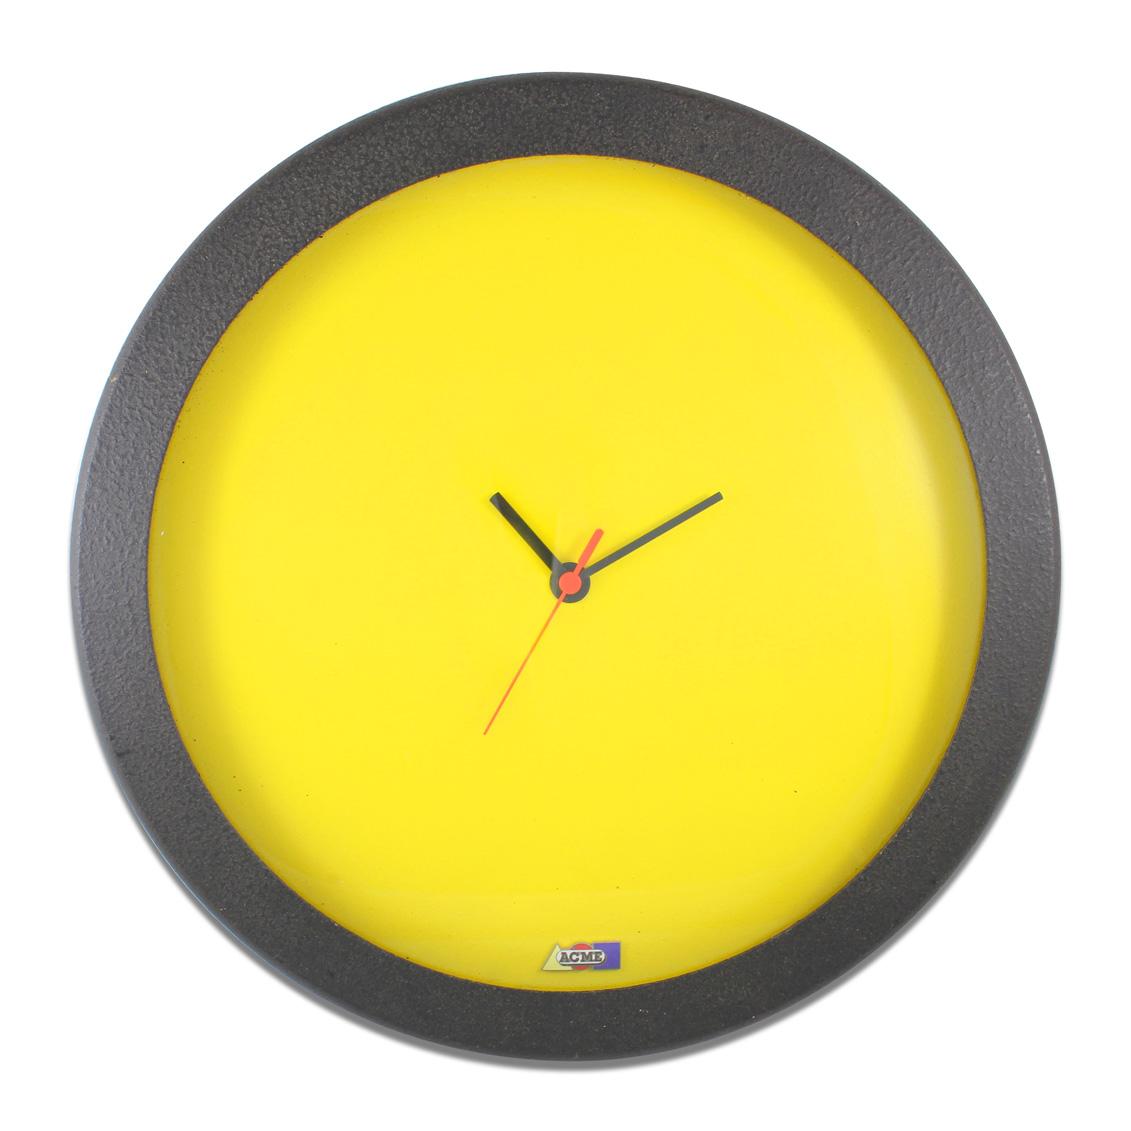 Shop ACME Colored Clock Set by ACME Studio (#OCLK04SET) on ACME Studio